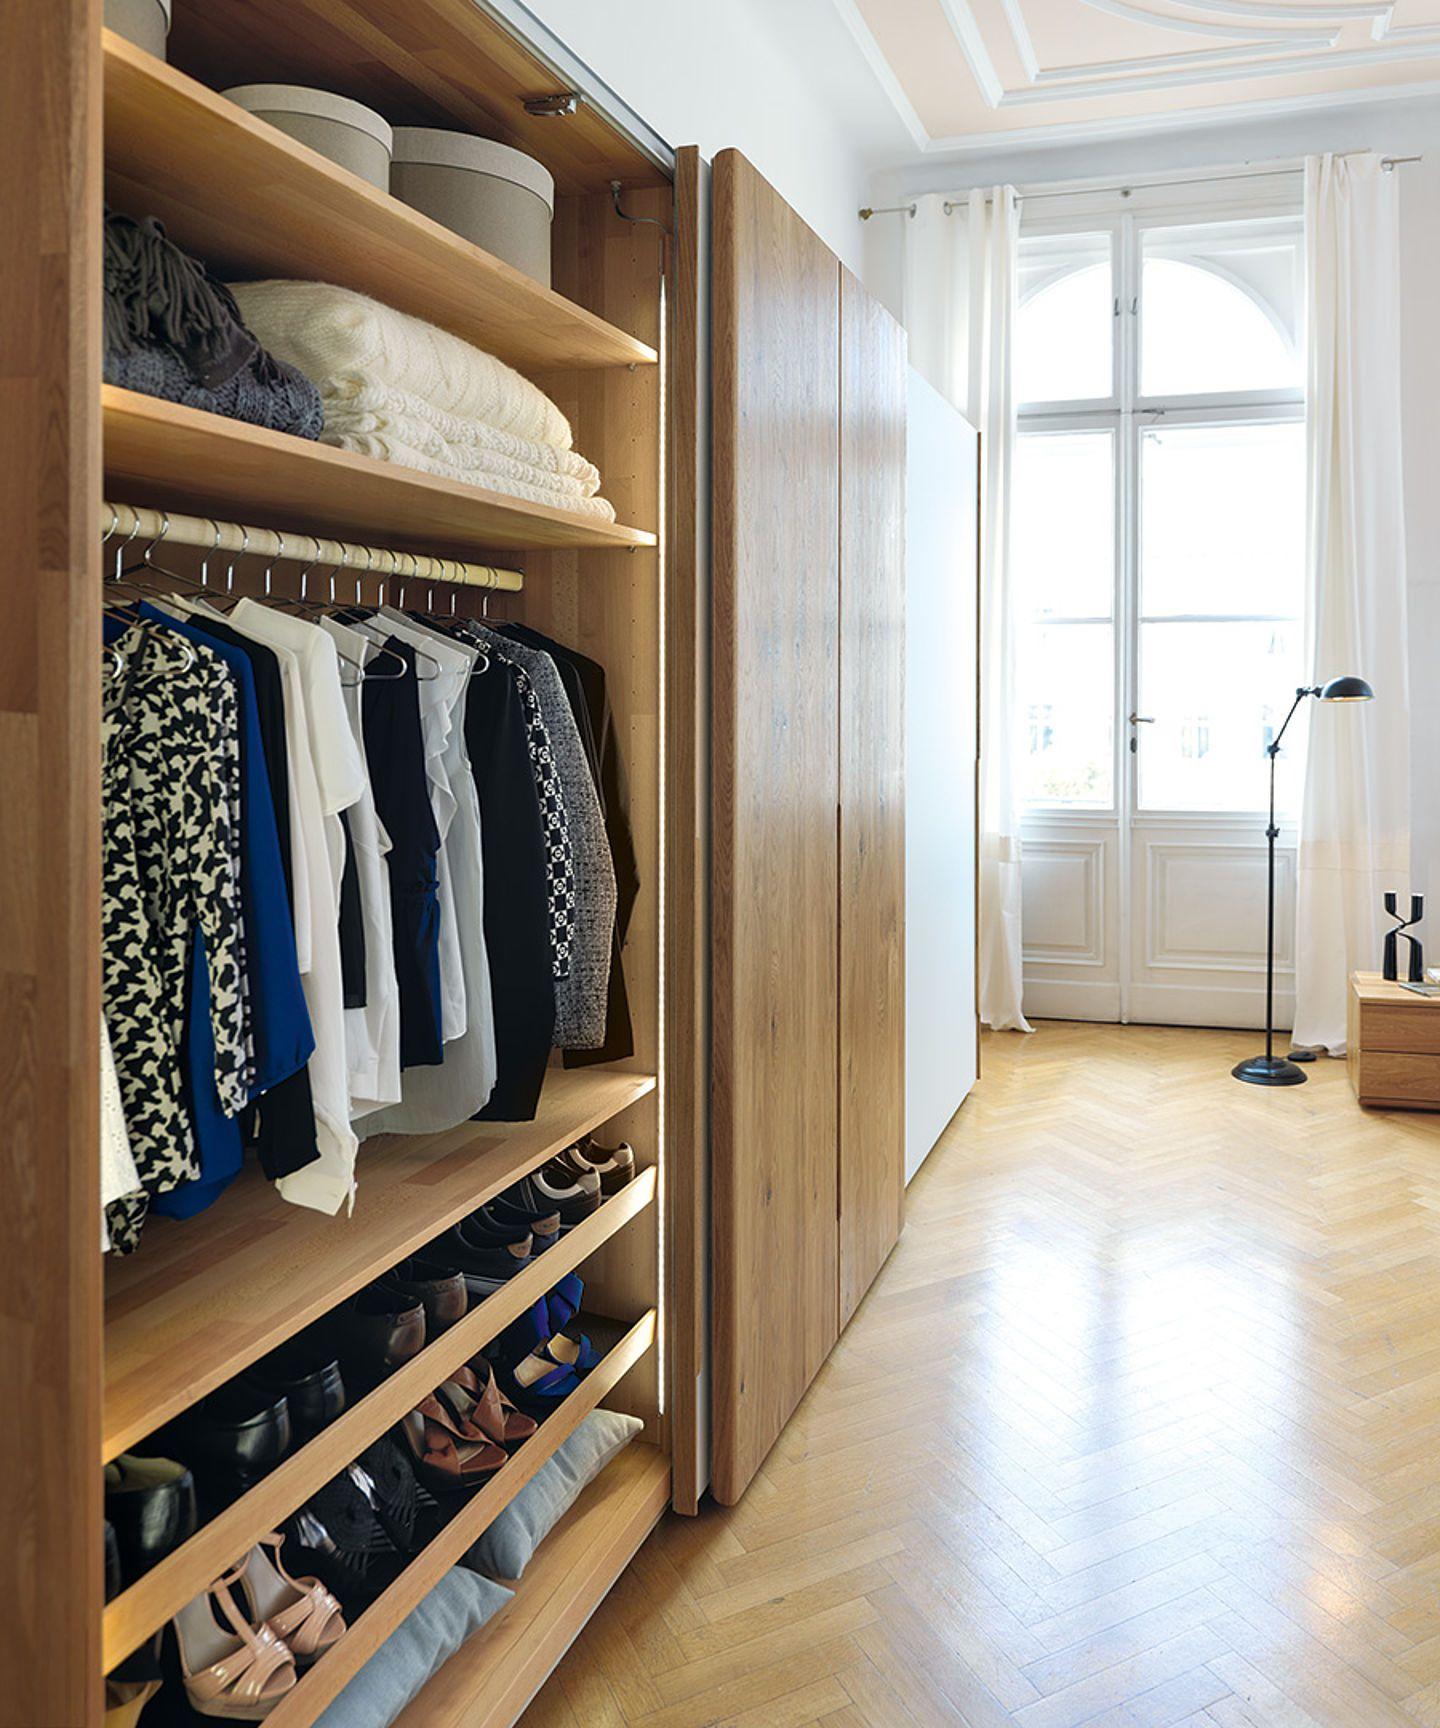 Best Kitchen Gallery: Bedroom Wardrobe Interior Nox Wardrobe Wardrobes Pinterest of Bedroom Wardrobe Systems on rachelxblog.com